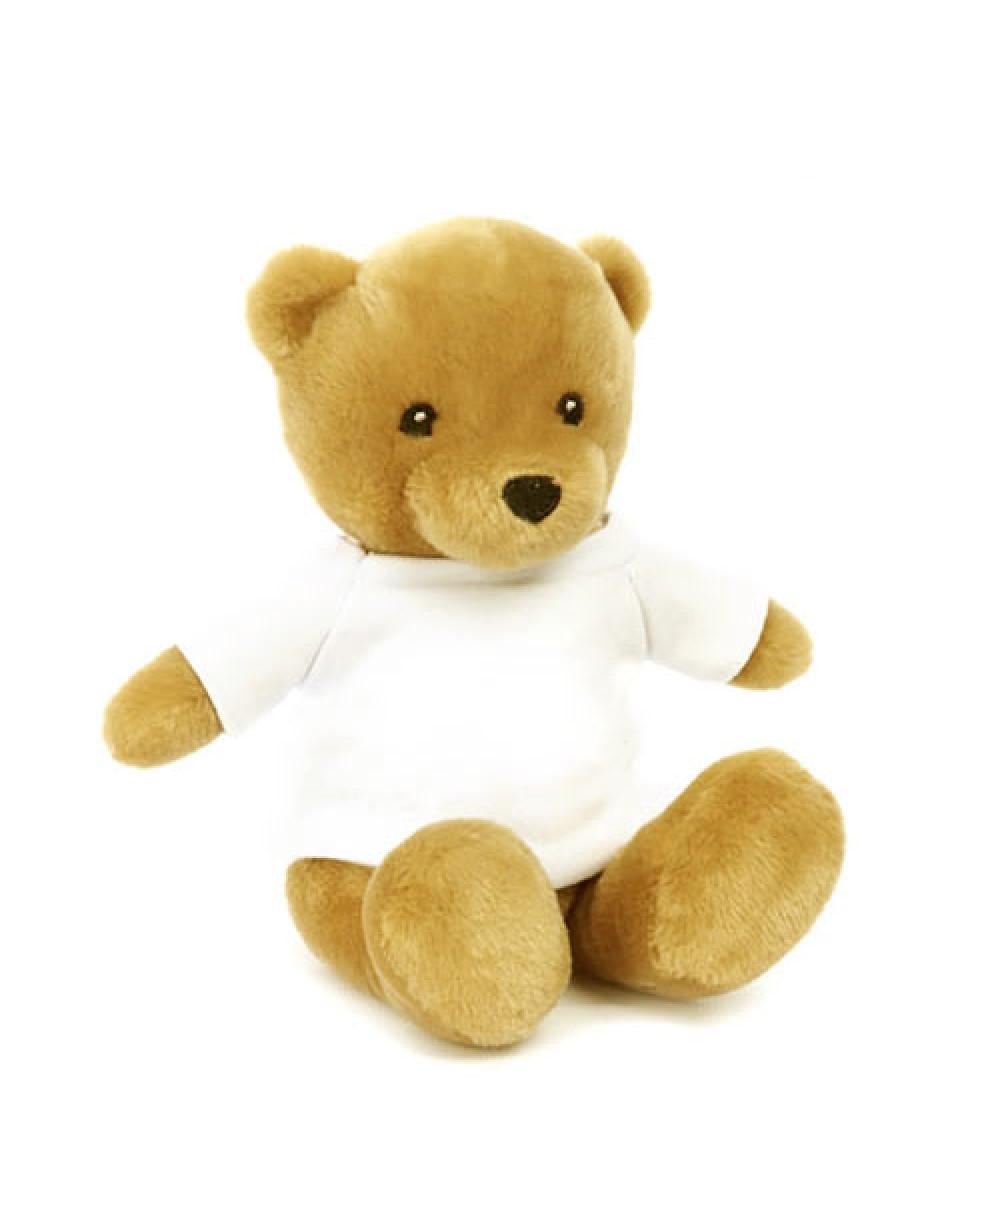 Sublimation Teddy Bear with T-Shirt - 1 Blank